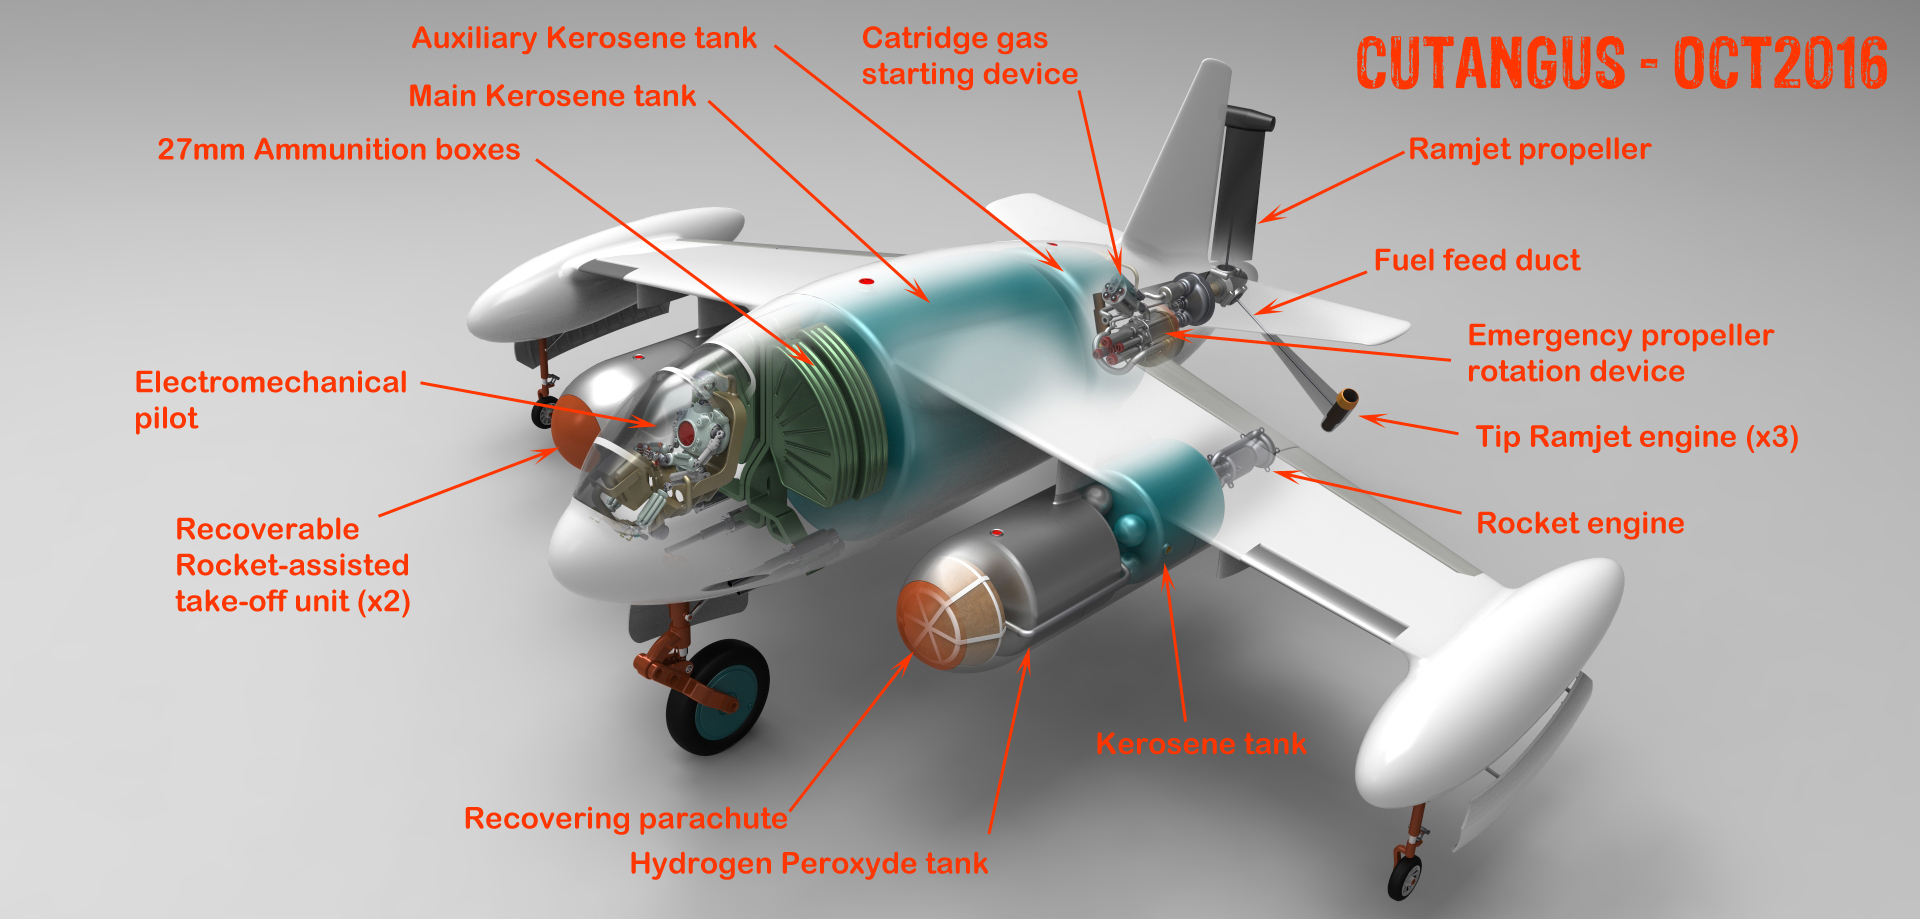 Ramjet propeller driven interceptor Cu-113 (II) by CUTANGUS